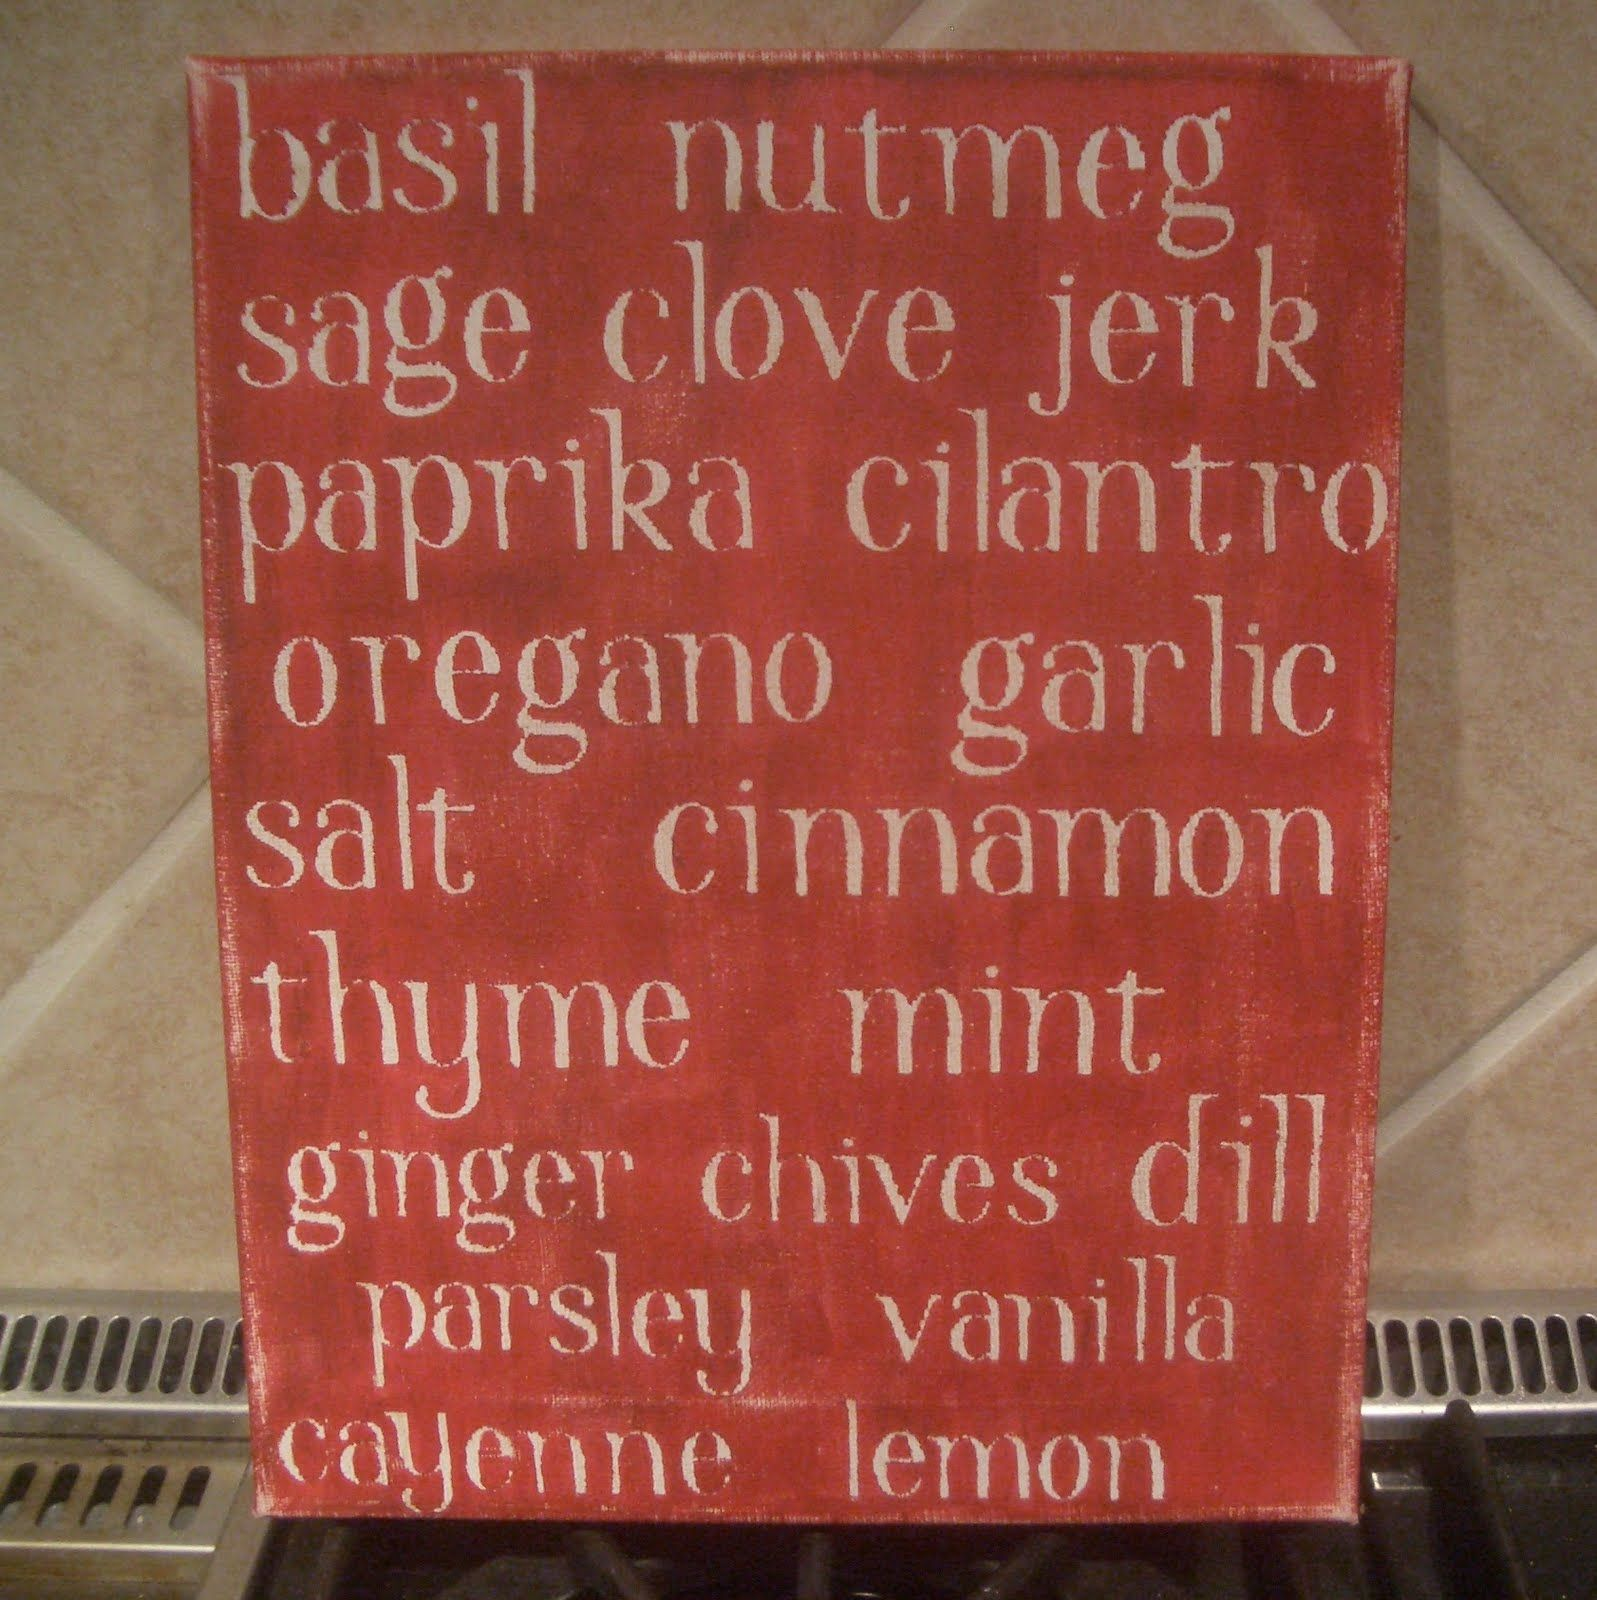 Basil Nutmeg Sage Clove Jerk Paprika Cilantro Oregano